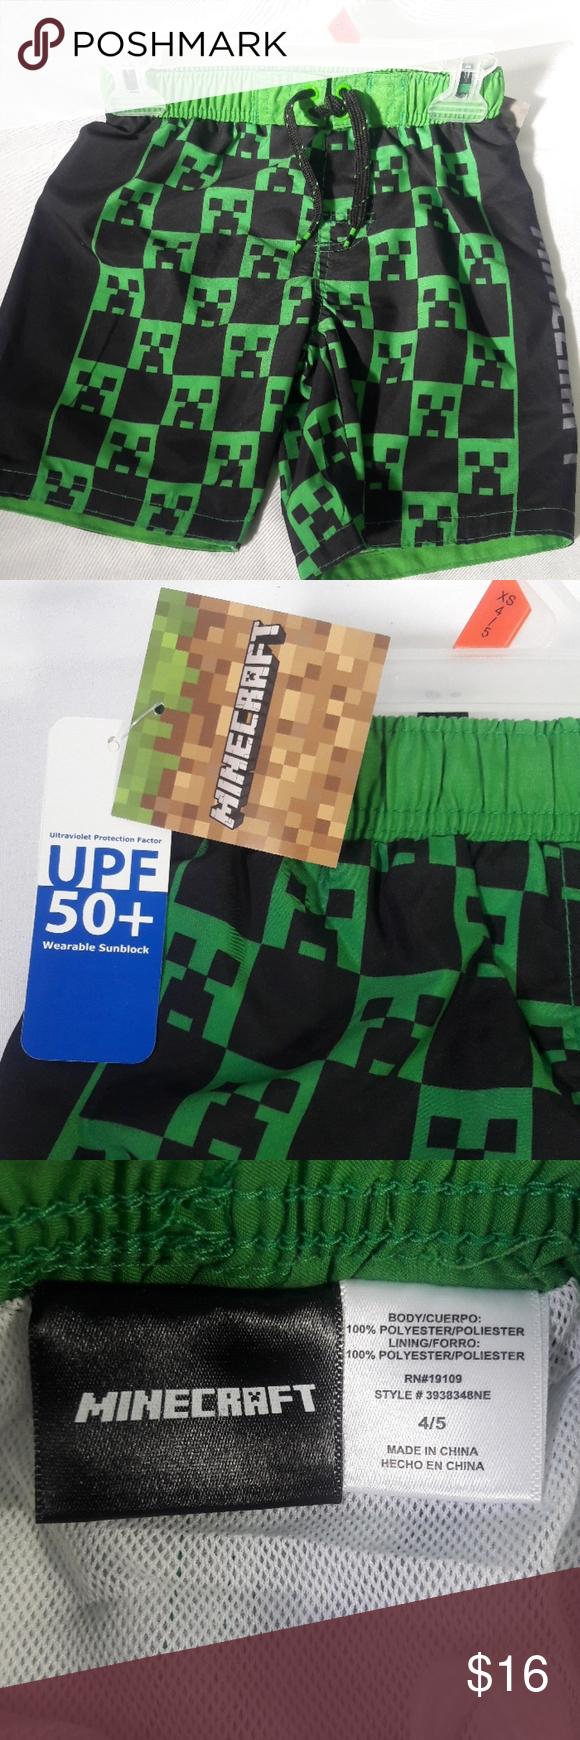 0ac570d5db Minecraft swim trunks Young boys size 4 - 5 Minecraft swim trunks Minecraft  Swim Swim Trunks